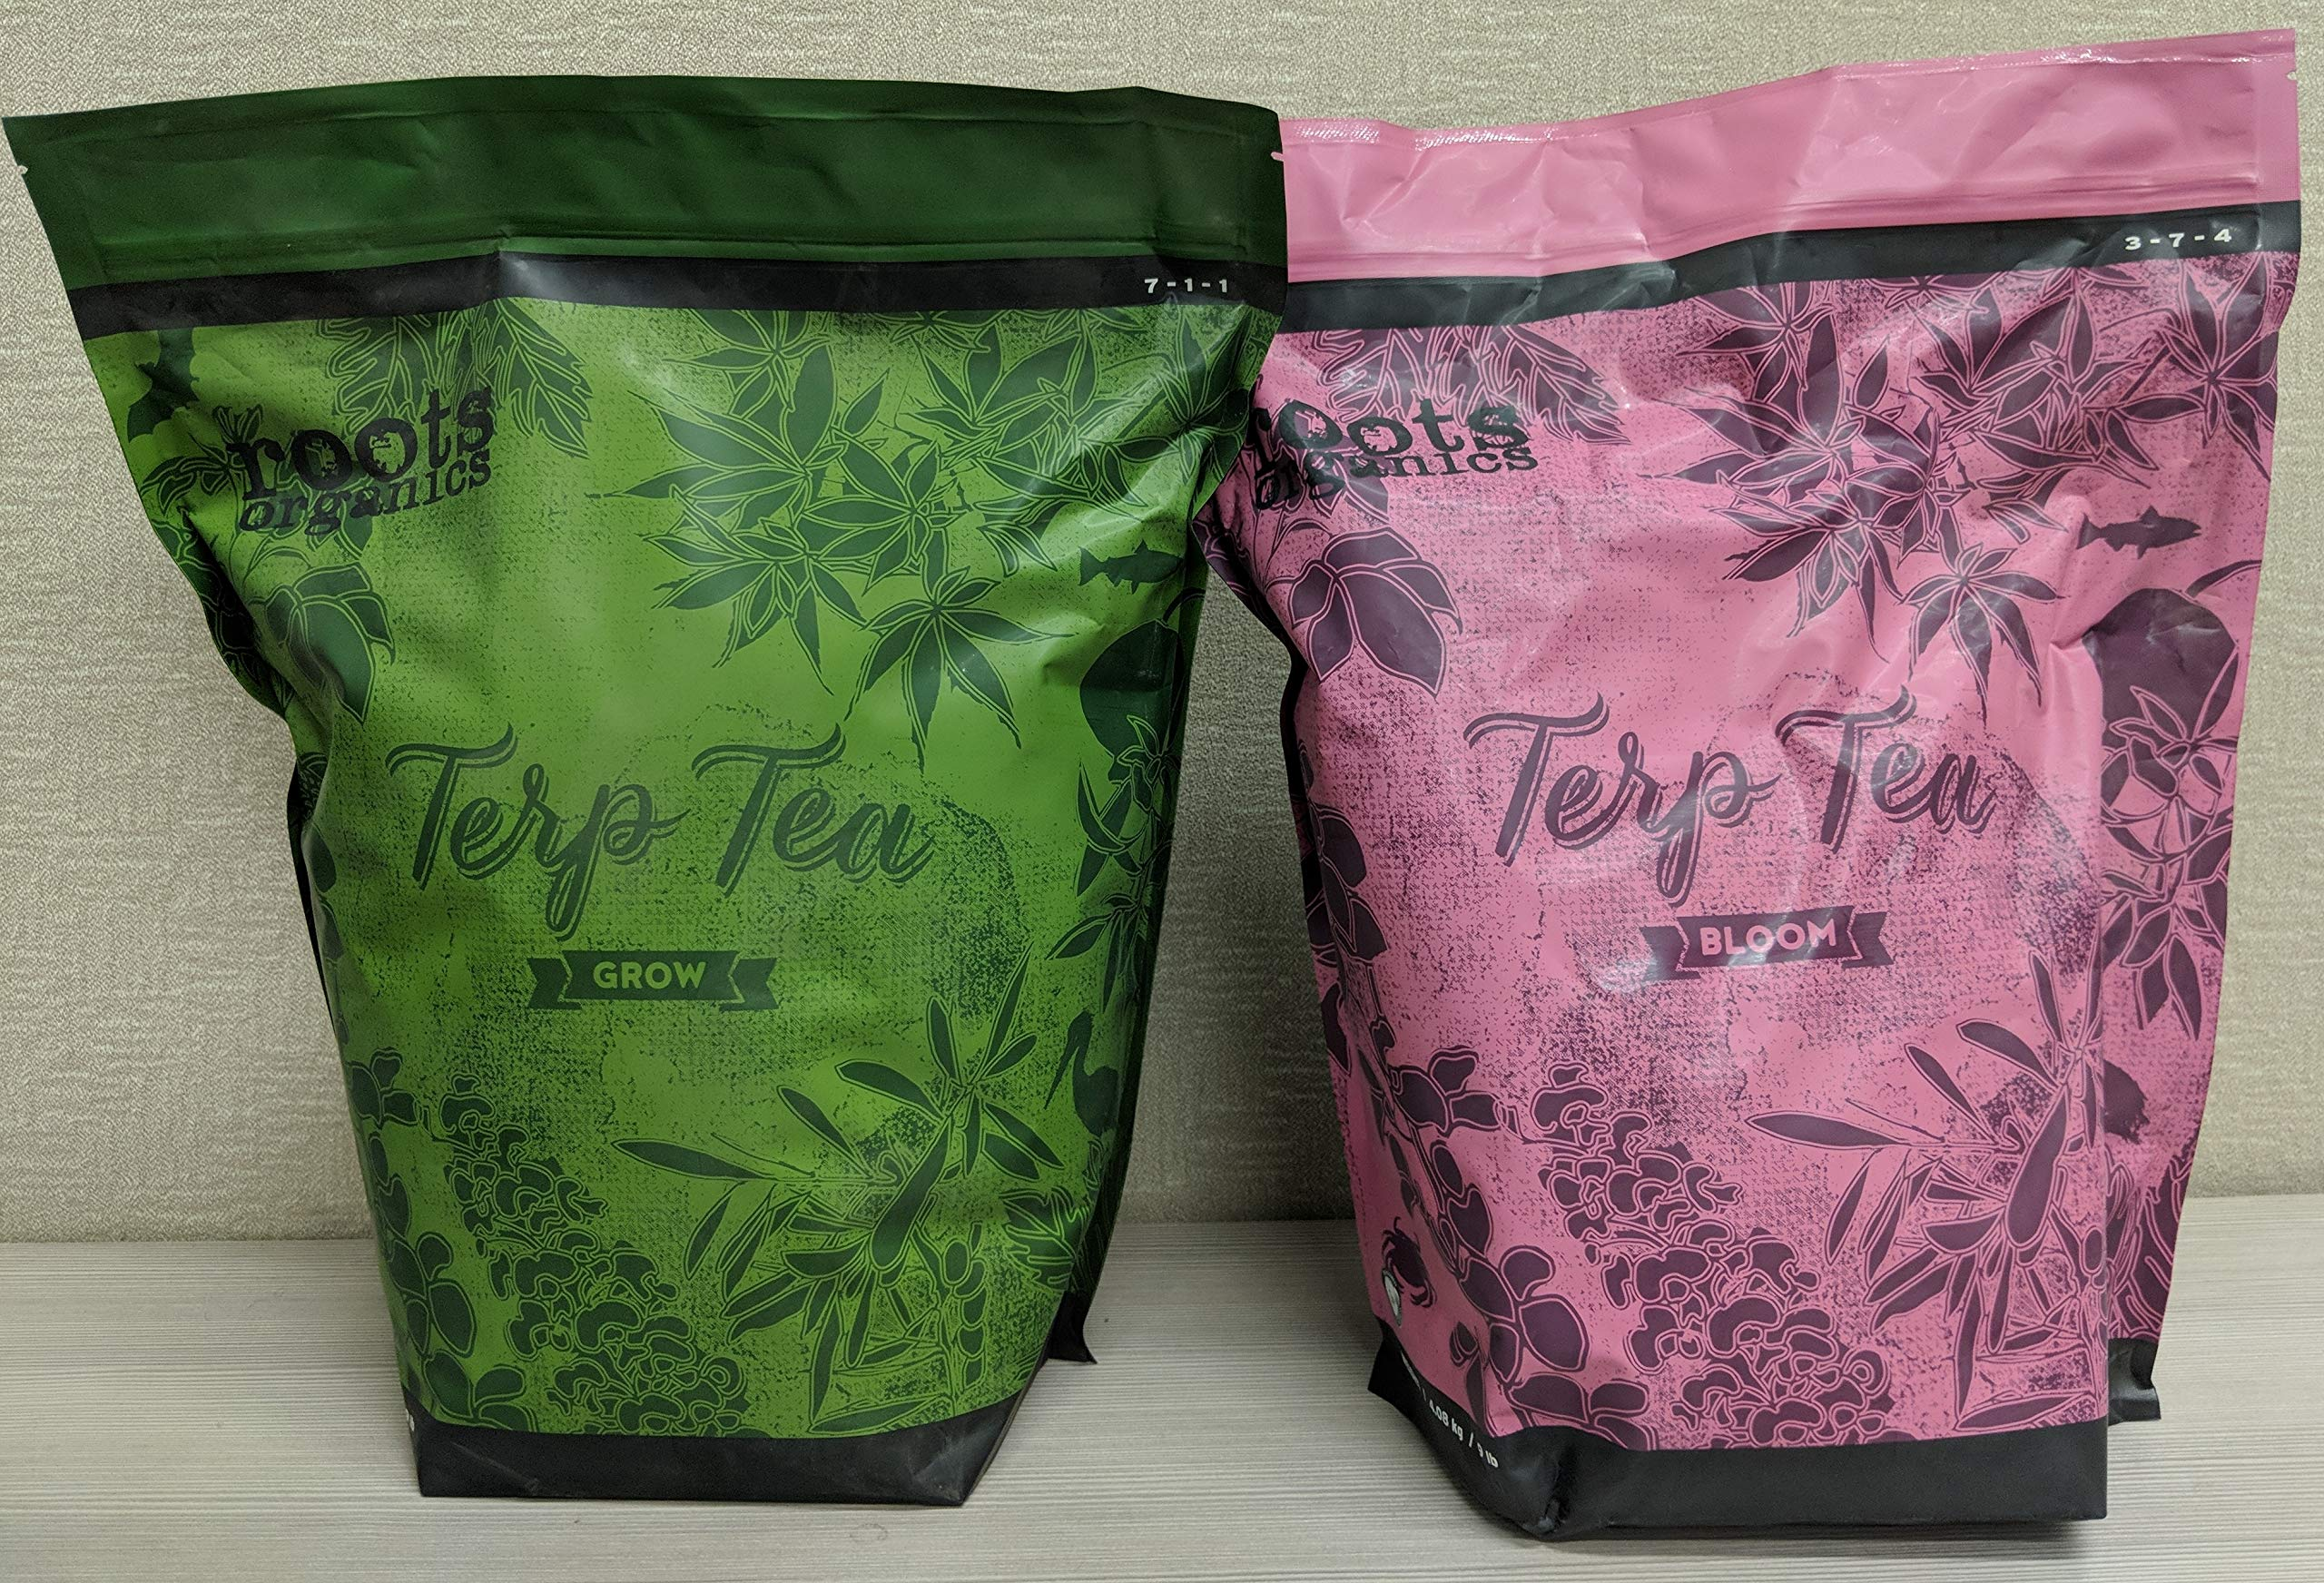 Roots Organics Terp Tea Combo Set (Grow + Bloom), 9 lb Bags